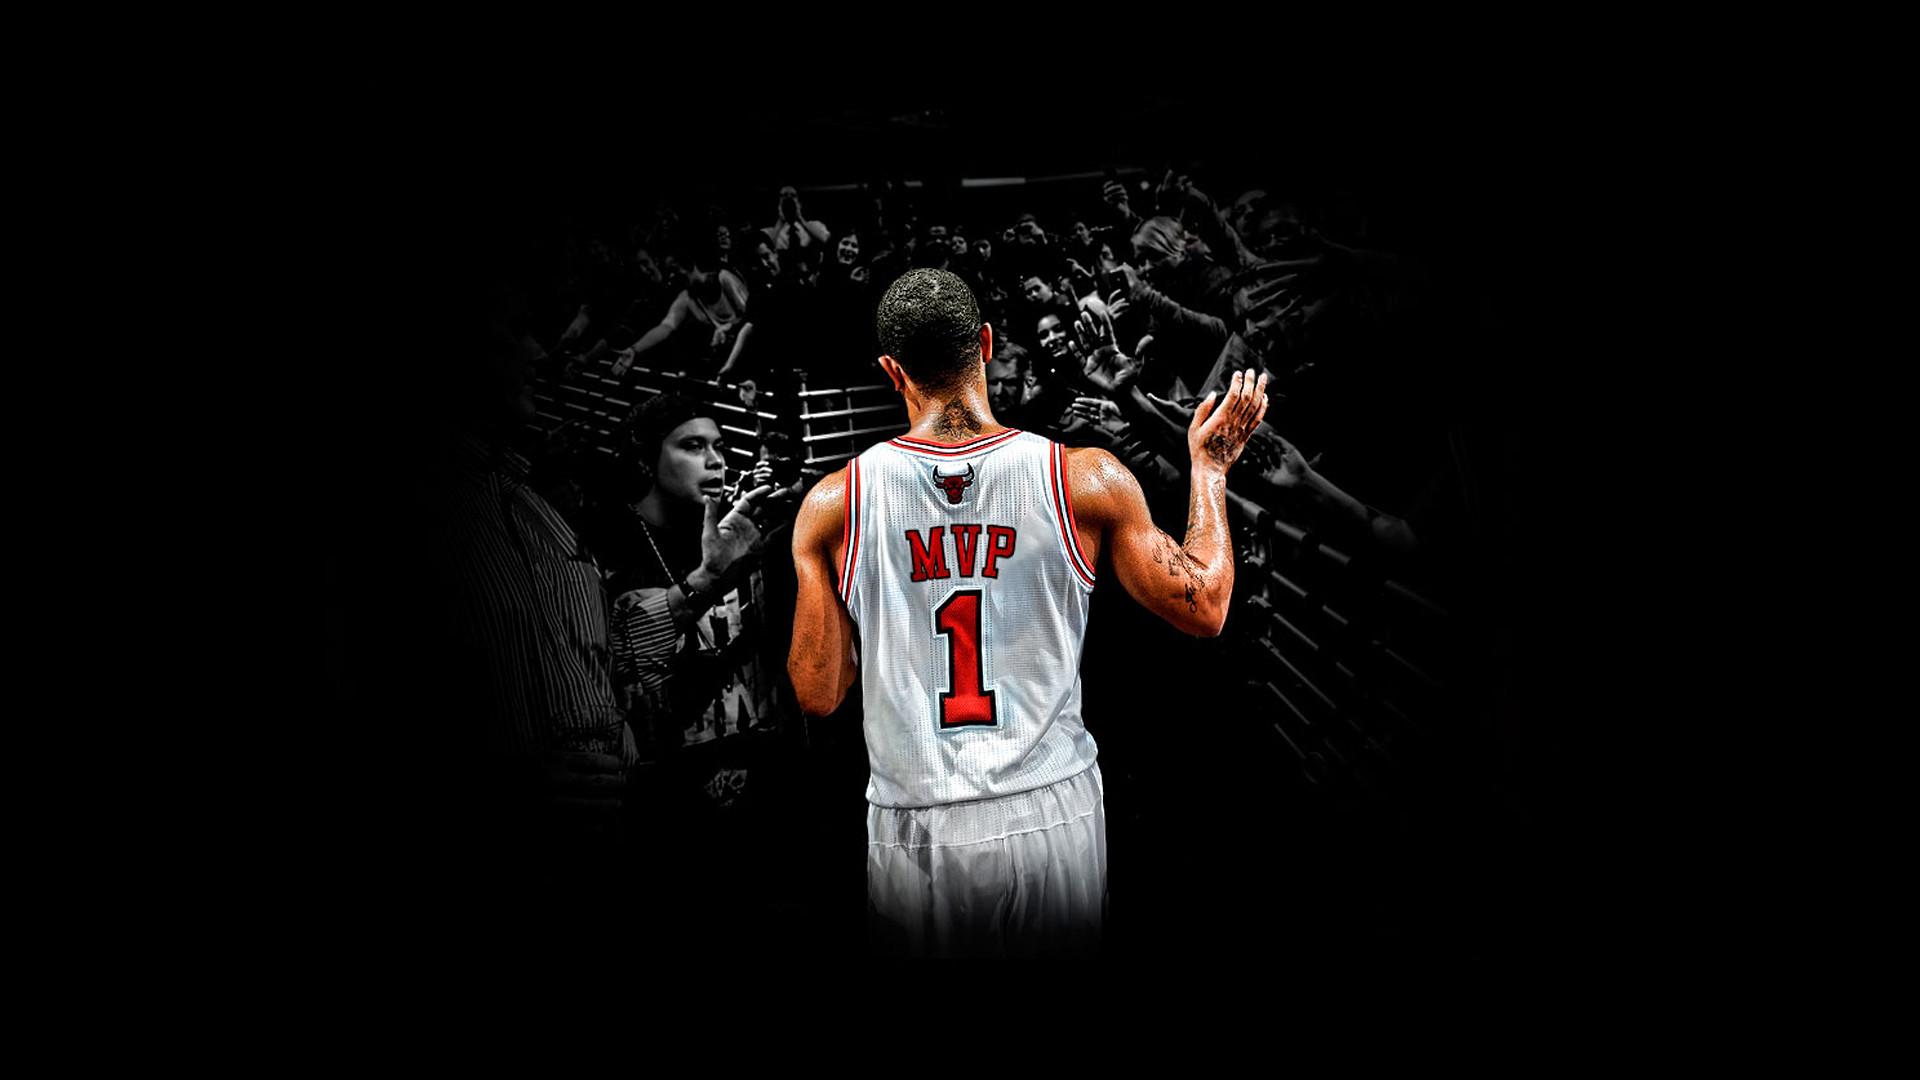 Chicago Bulls 1 Derrick Rose wallpaper